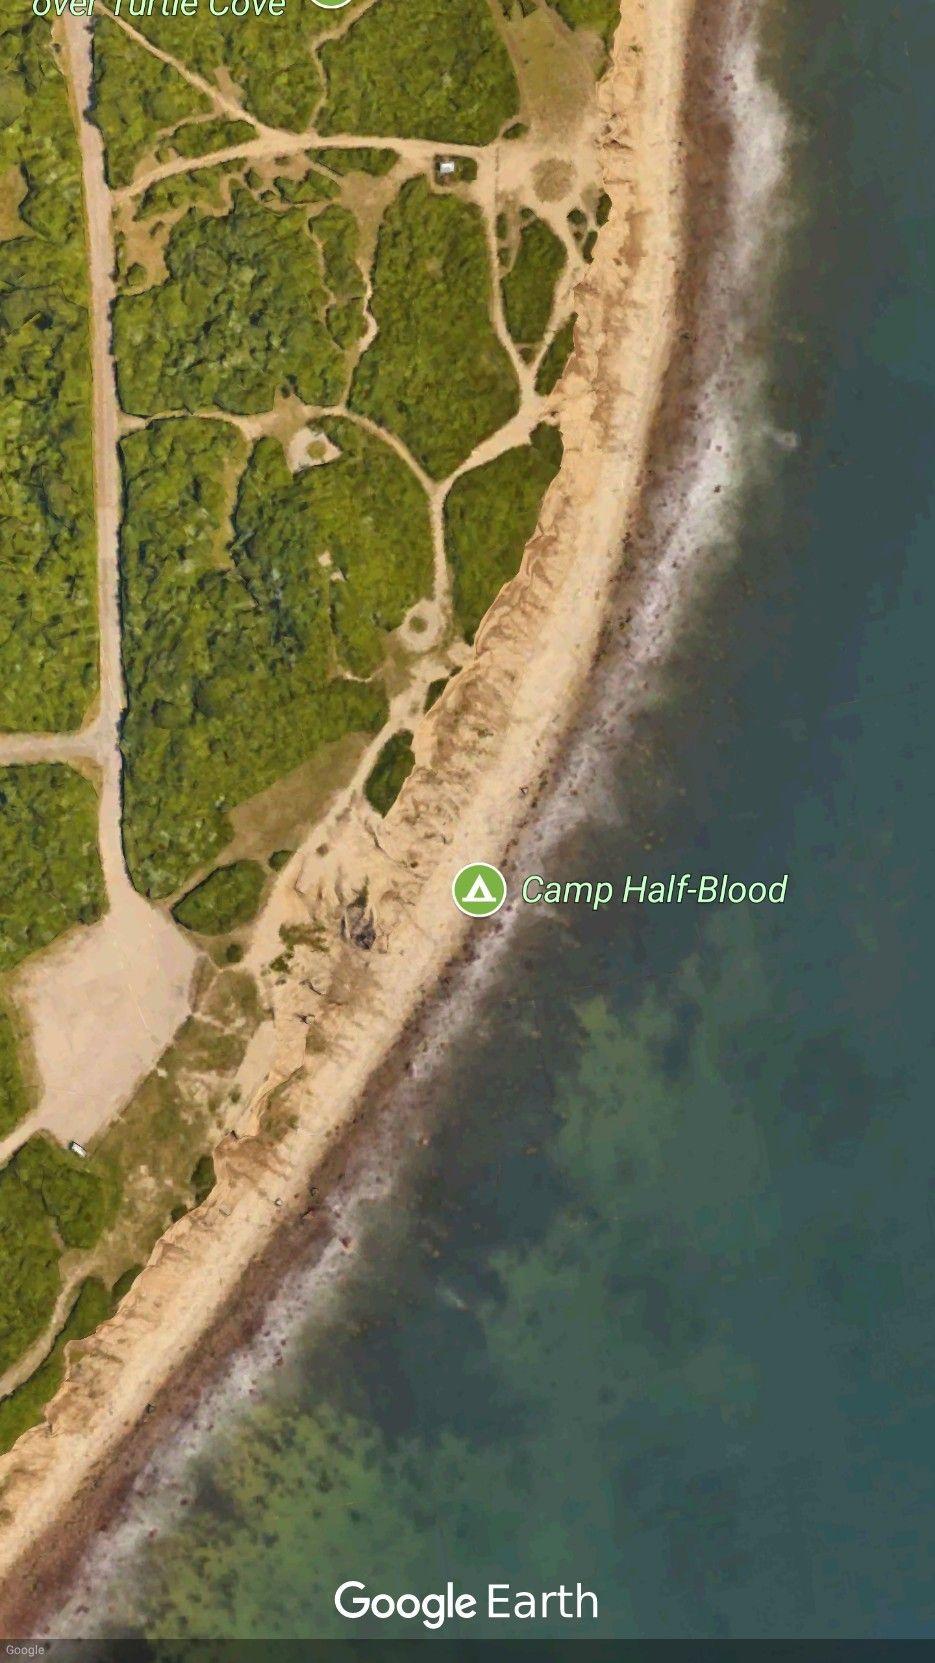 In Google Earth, search